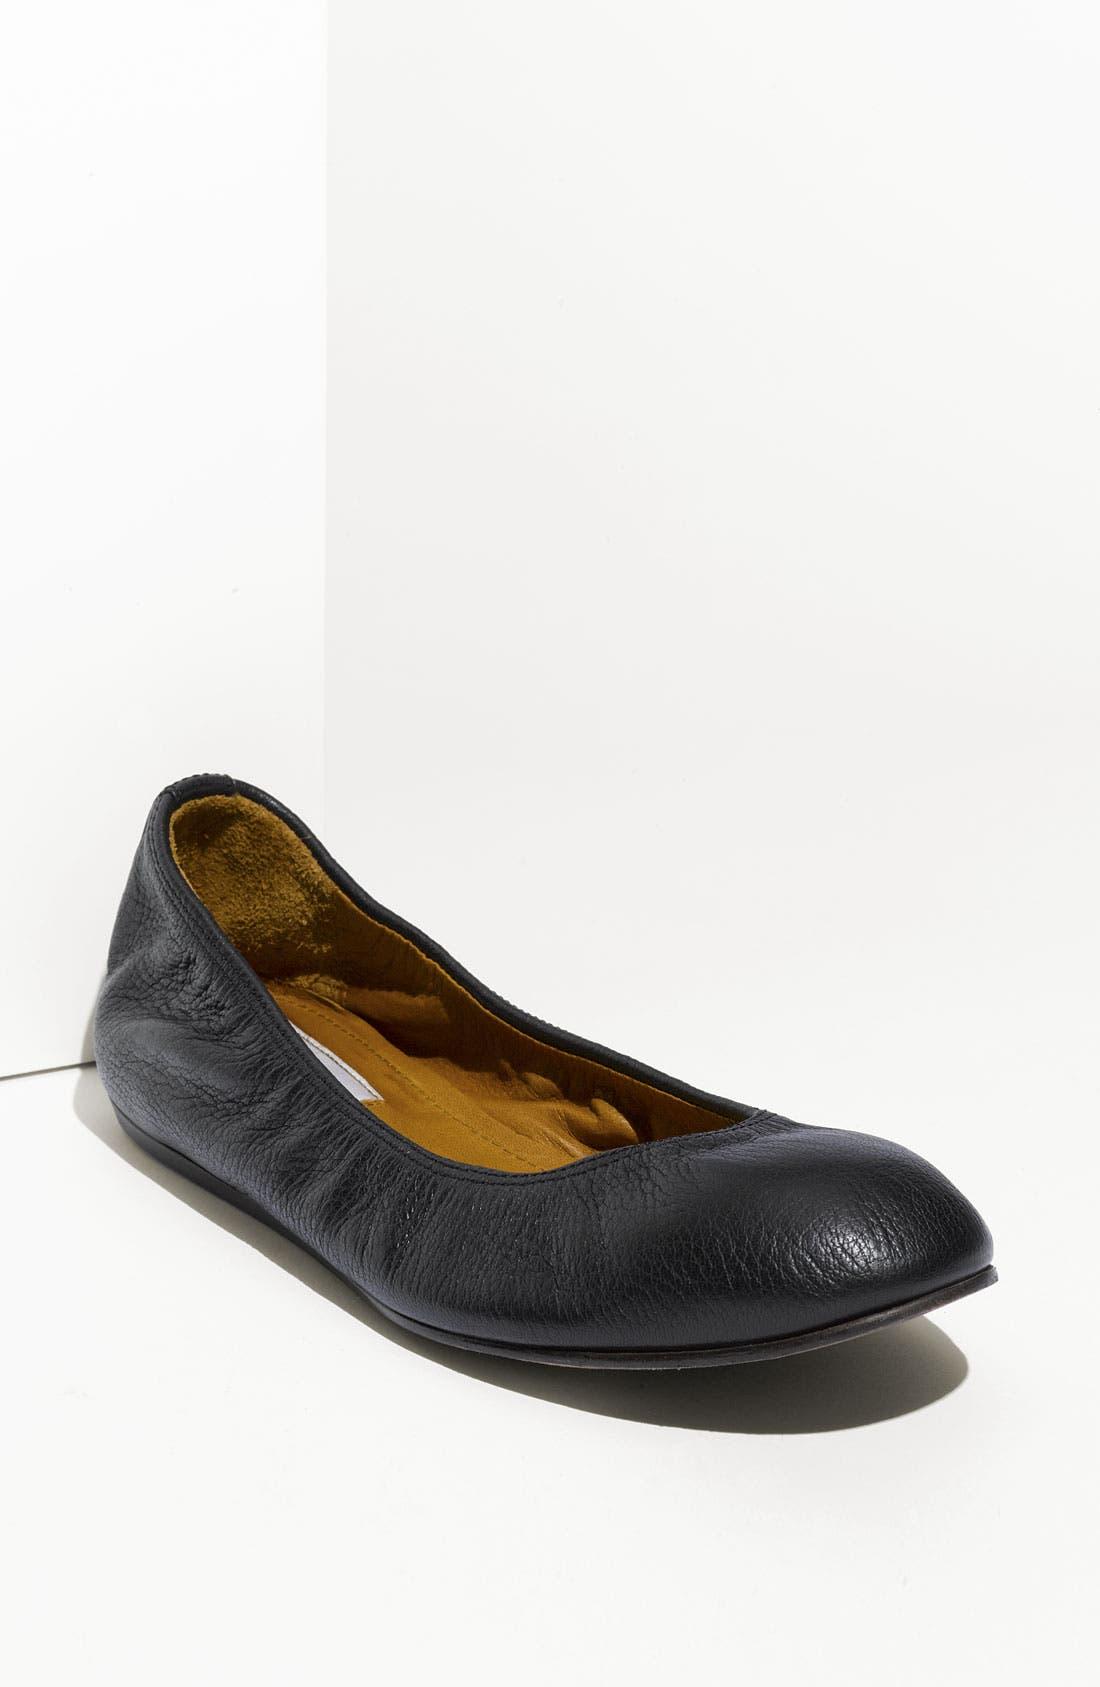 LANVIN,                             Classic Ballerina Flat,                             Main thumbnail 1, color,                             001